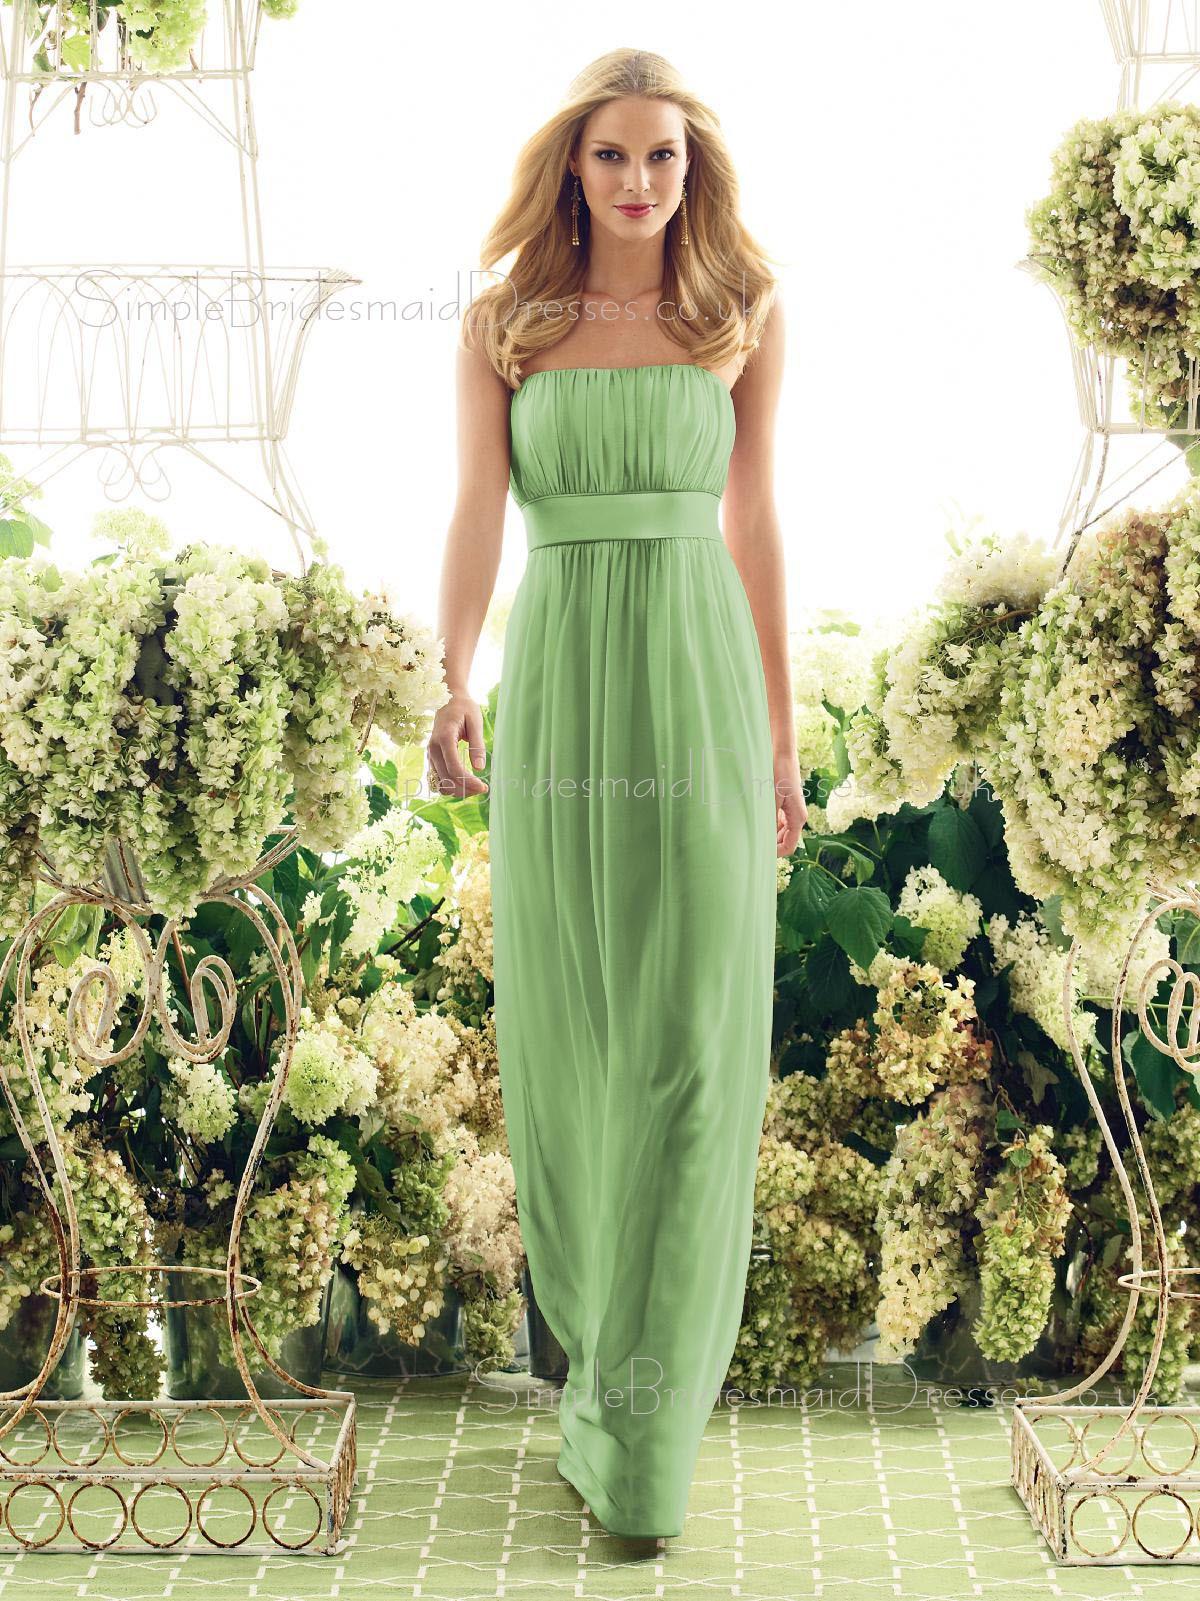 Wedding Sage Bridesmaid Dresses green bridesmaid dresses uk sage floor length empire drapedrufflessash sleeveless dress